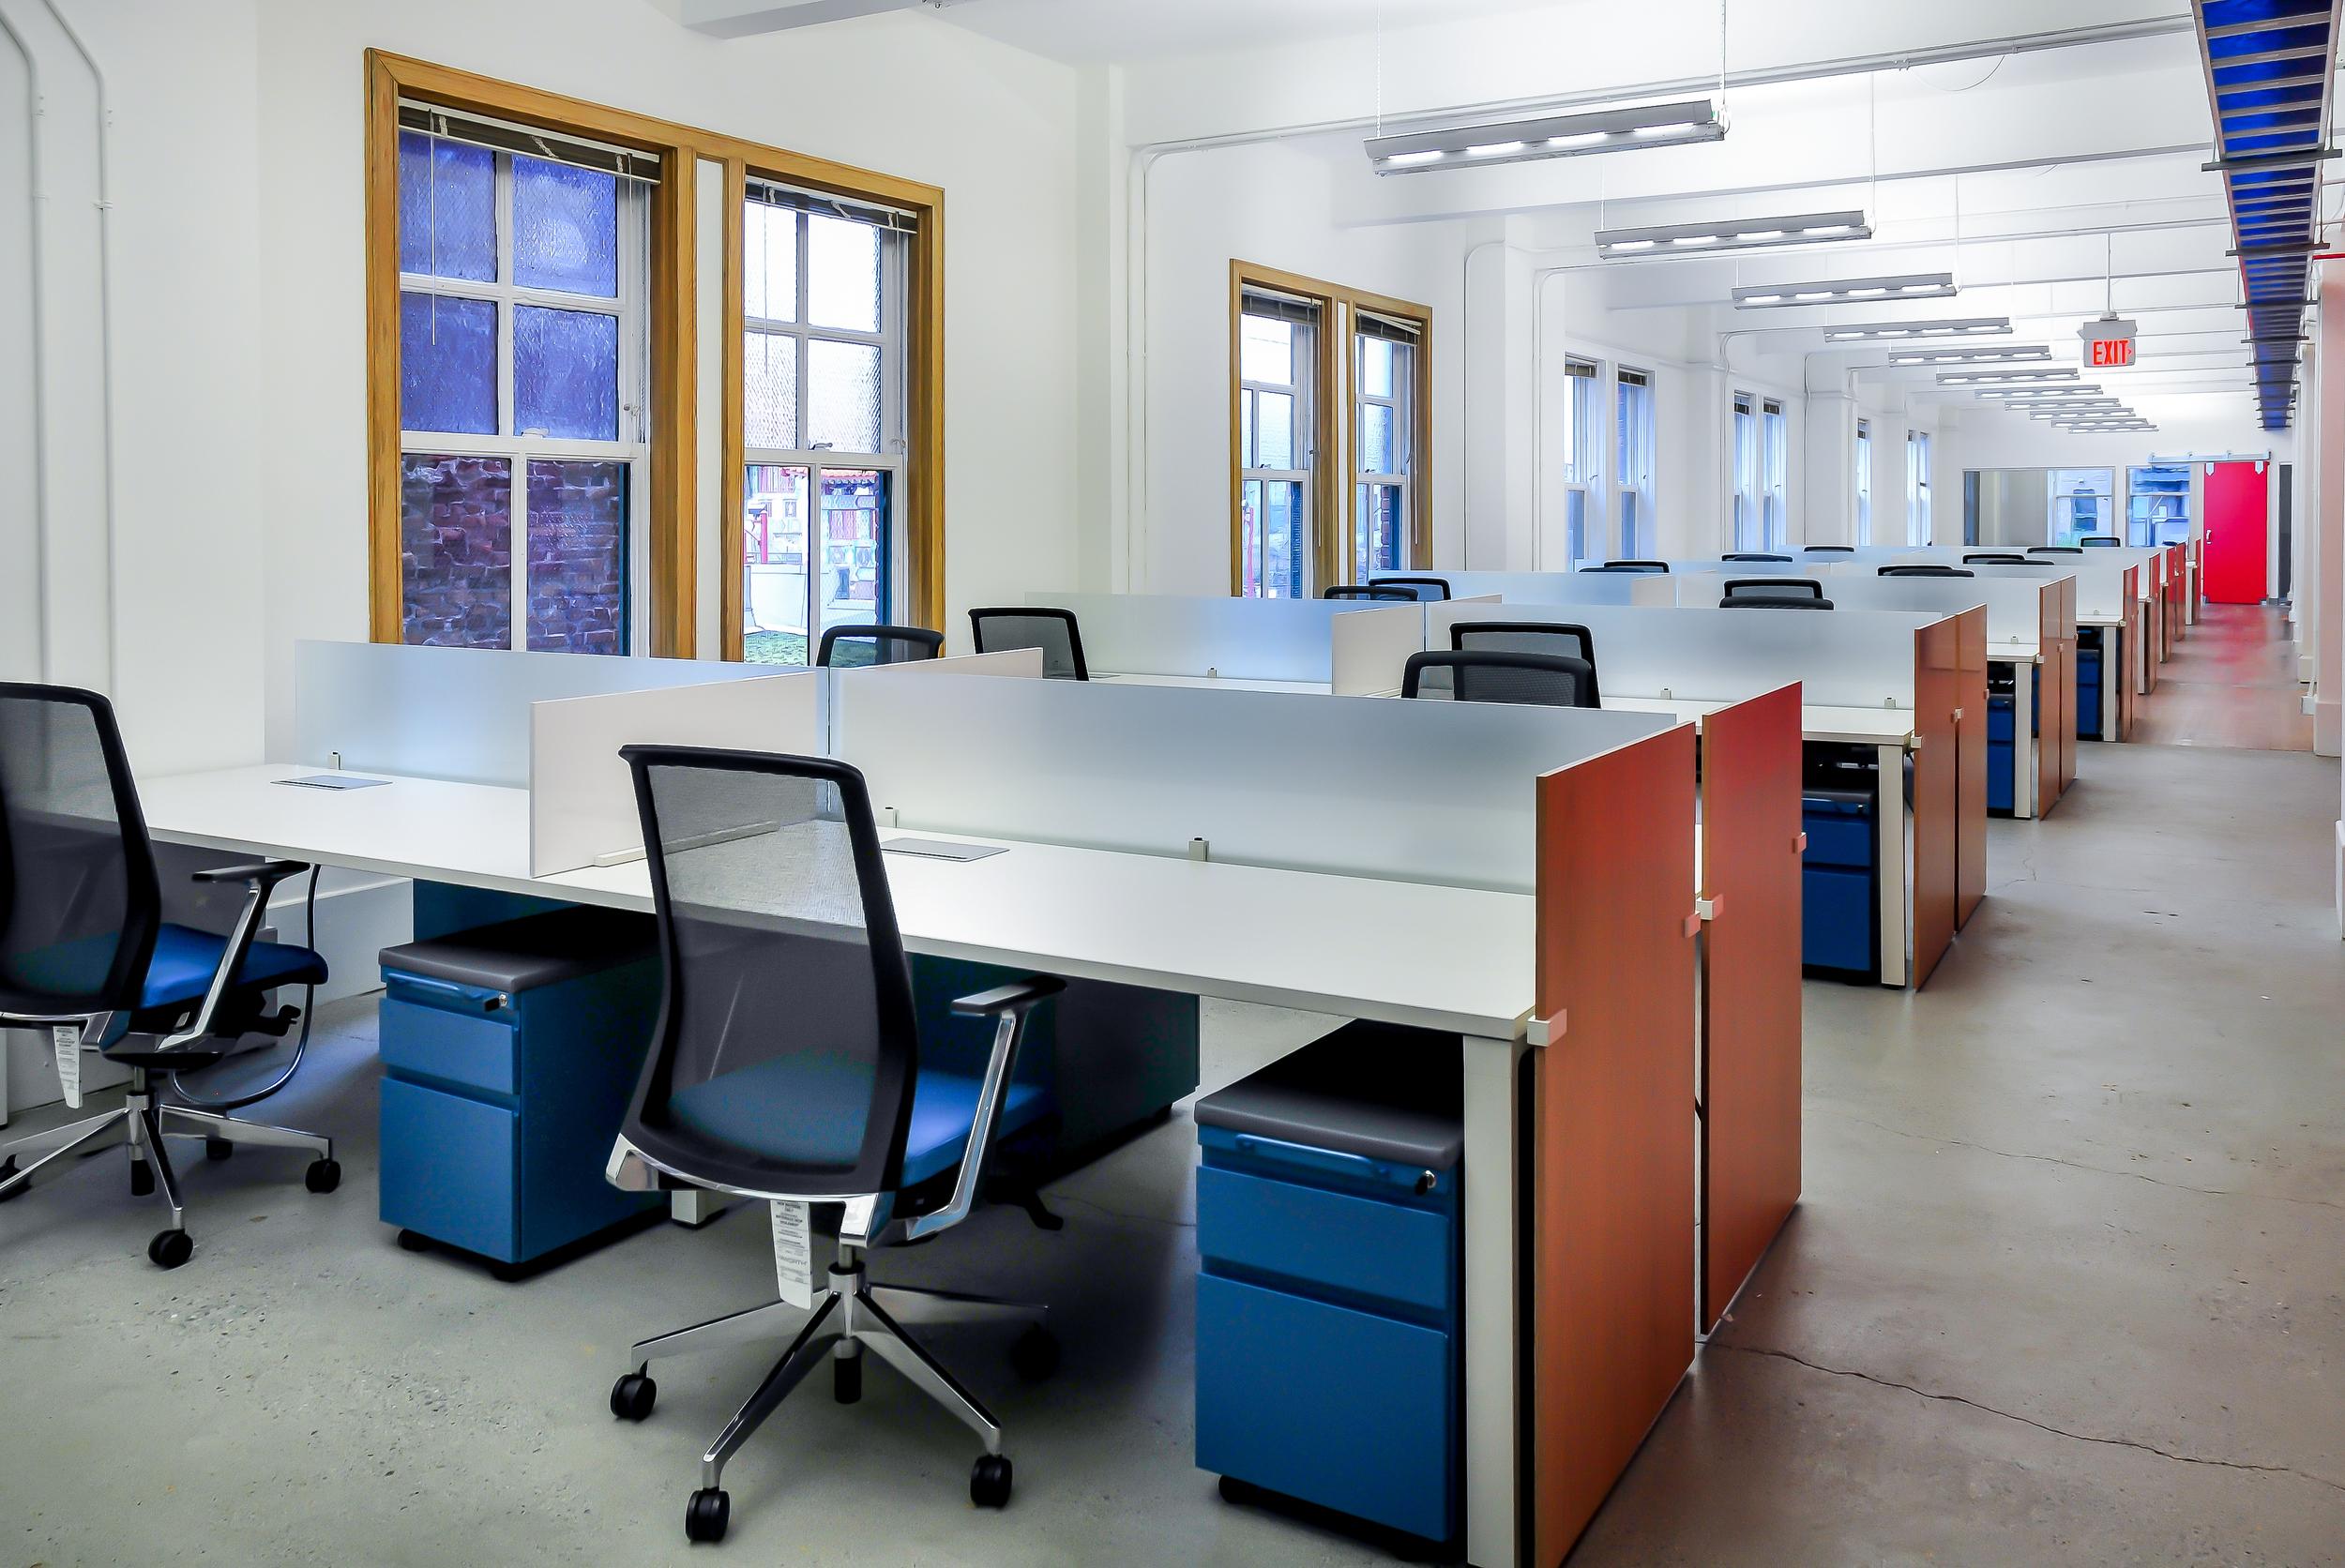 20140423-Gastown Office (5 of 21).jpg